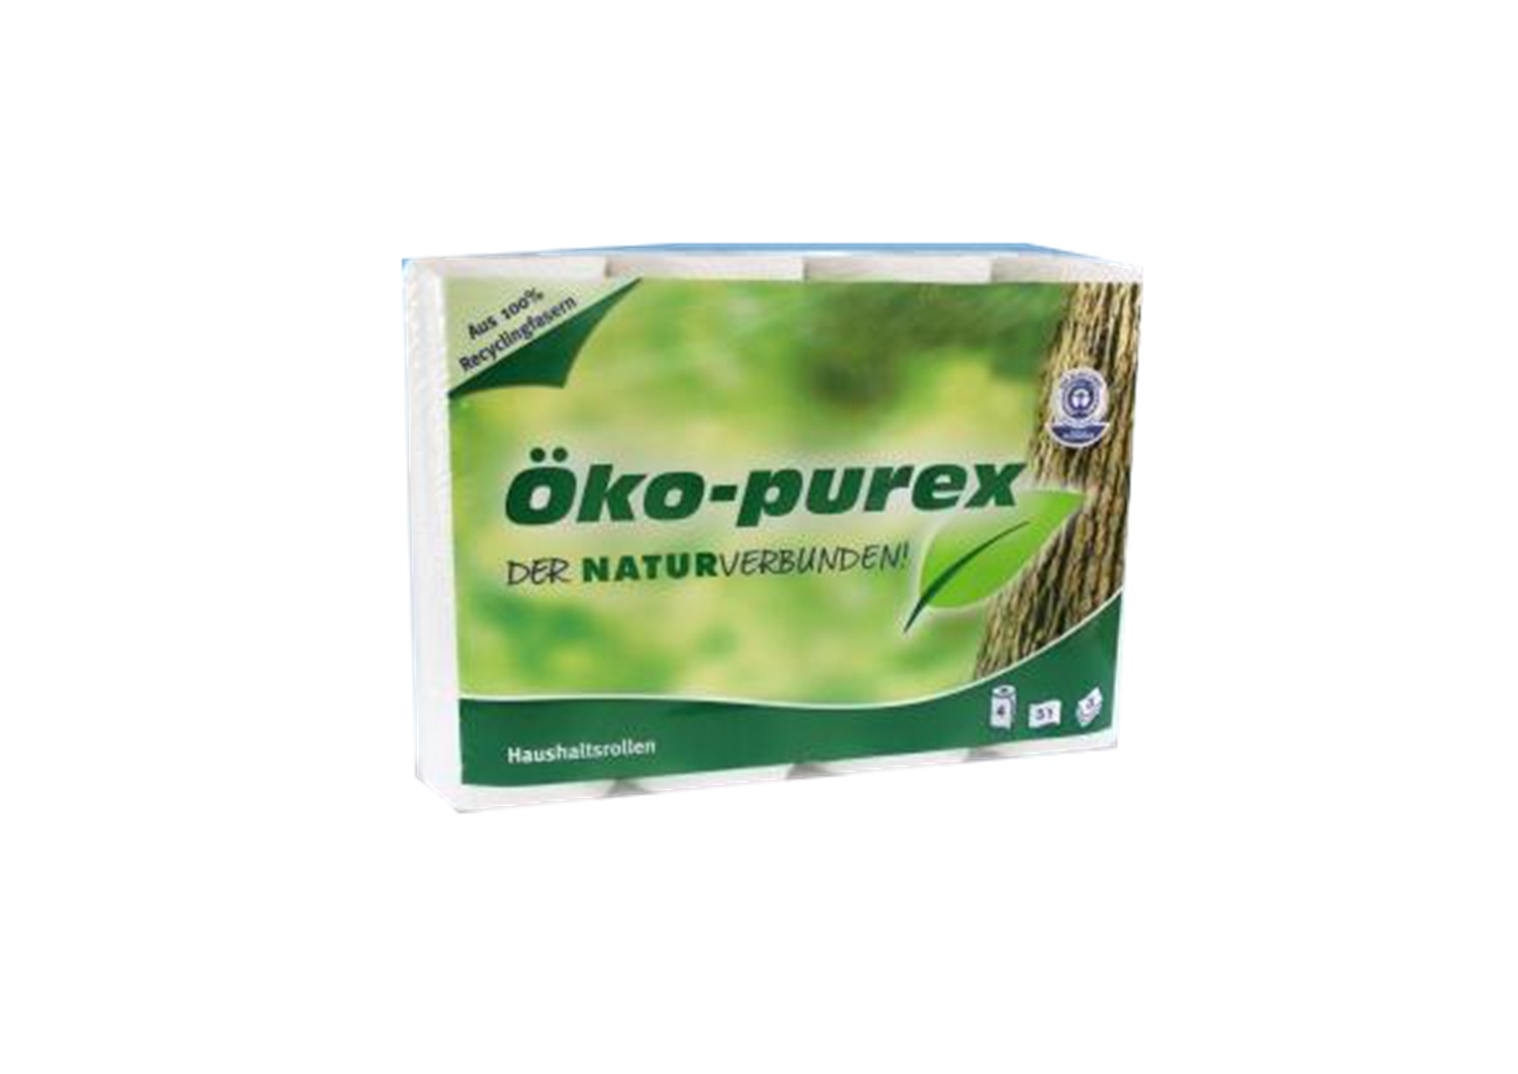 Haushaltsrollen Öko Purex 4 Rollen 51 Blatt / Rolle